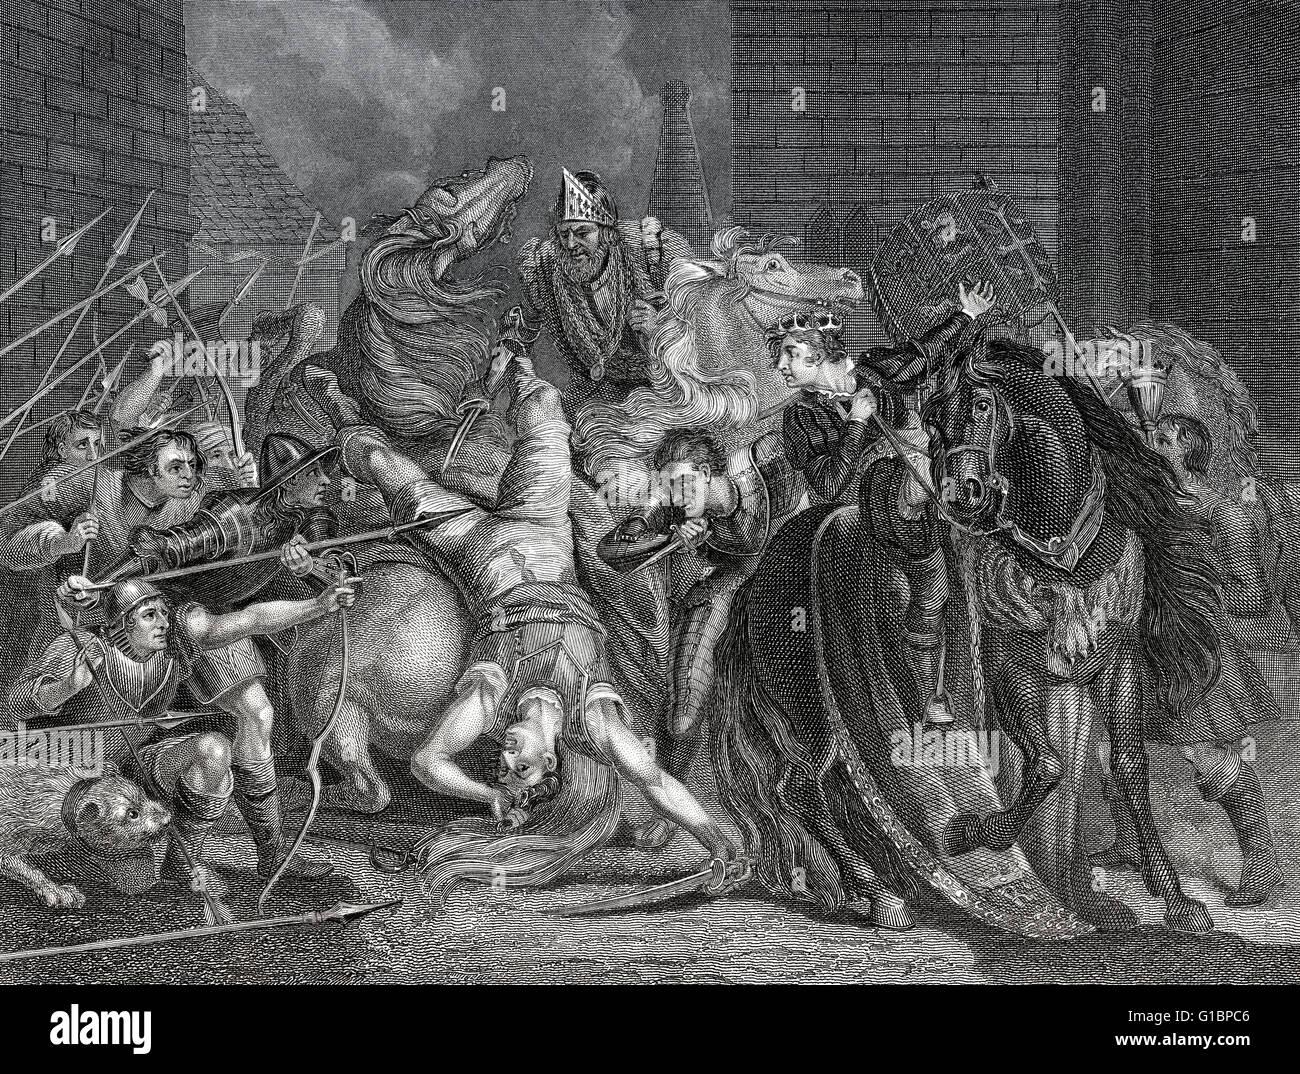 Sir William Walworth, Lord Mayor of London, killing Wat Tyler at Smithfield, English peasants' revolt of 1381 - Stock Image